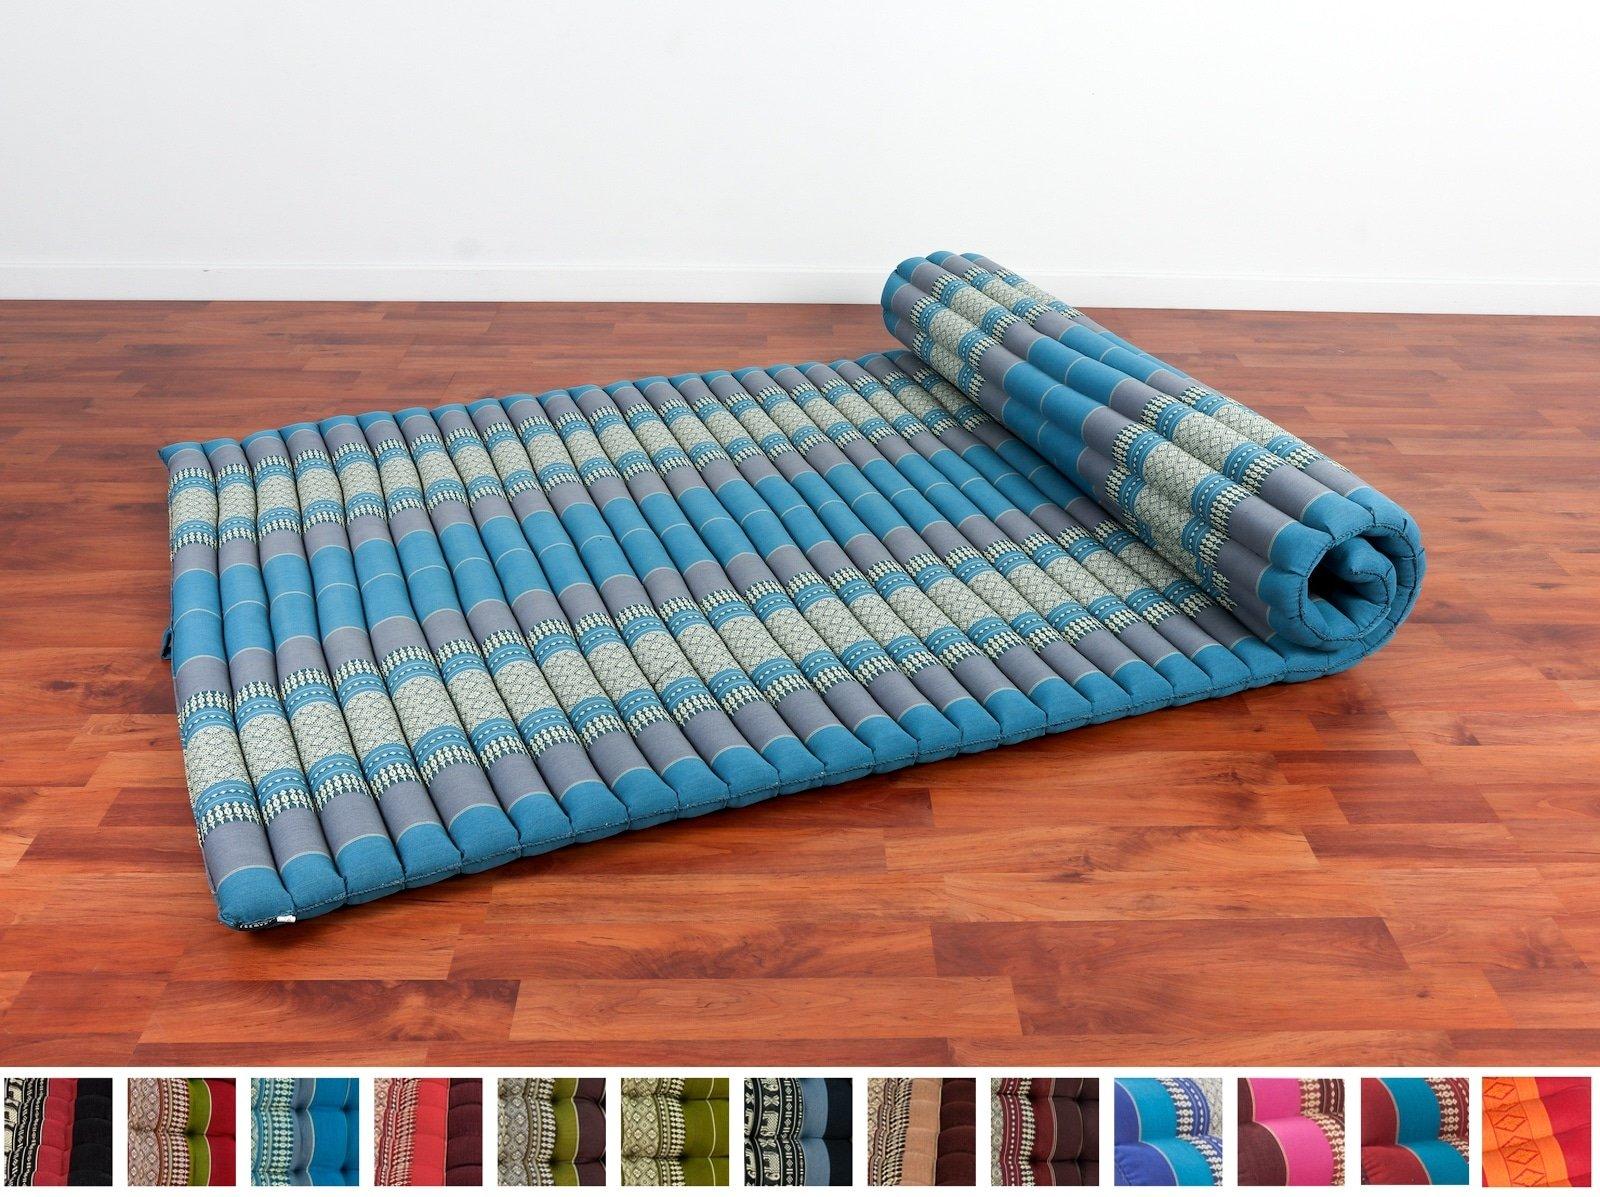 Leewadee Roll Up Thai Mattress XL, 79x41x2 inches, Kapok, Blue, Premium Double Stitched